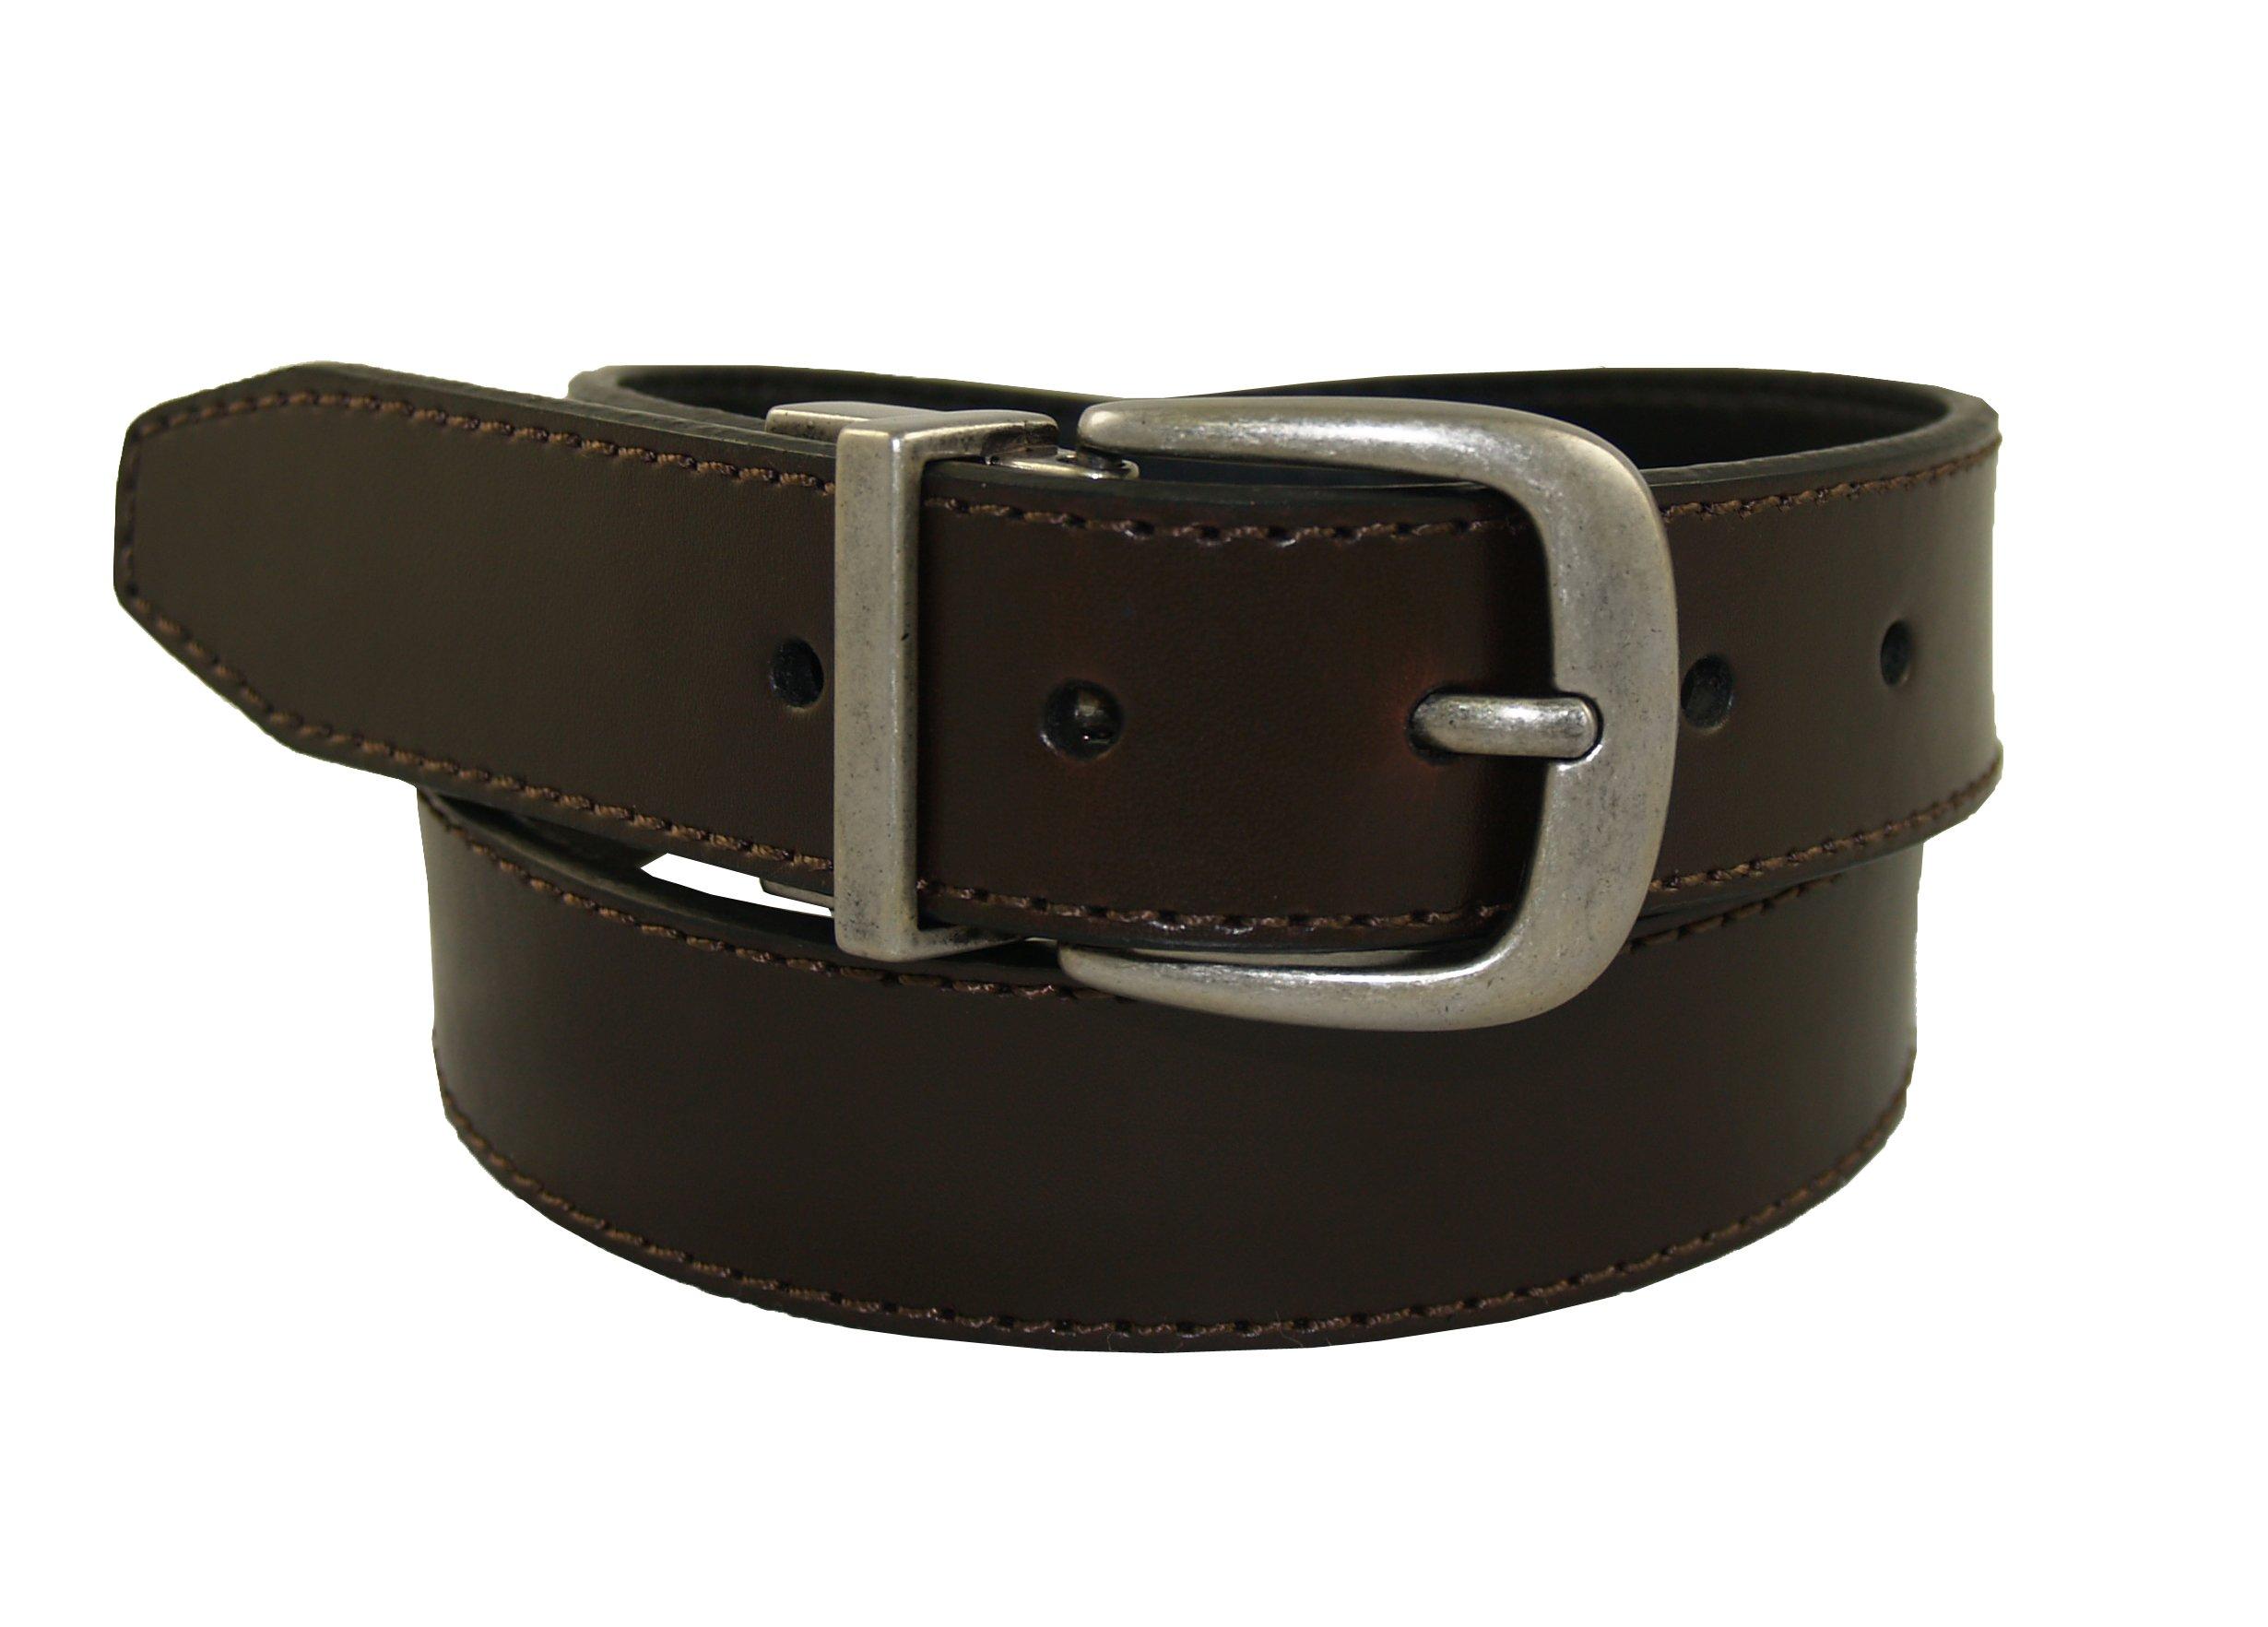 Levi's Men's Reversible Belt With Eagle Logo Buckle,Brown/Black, Medium